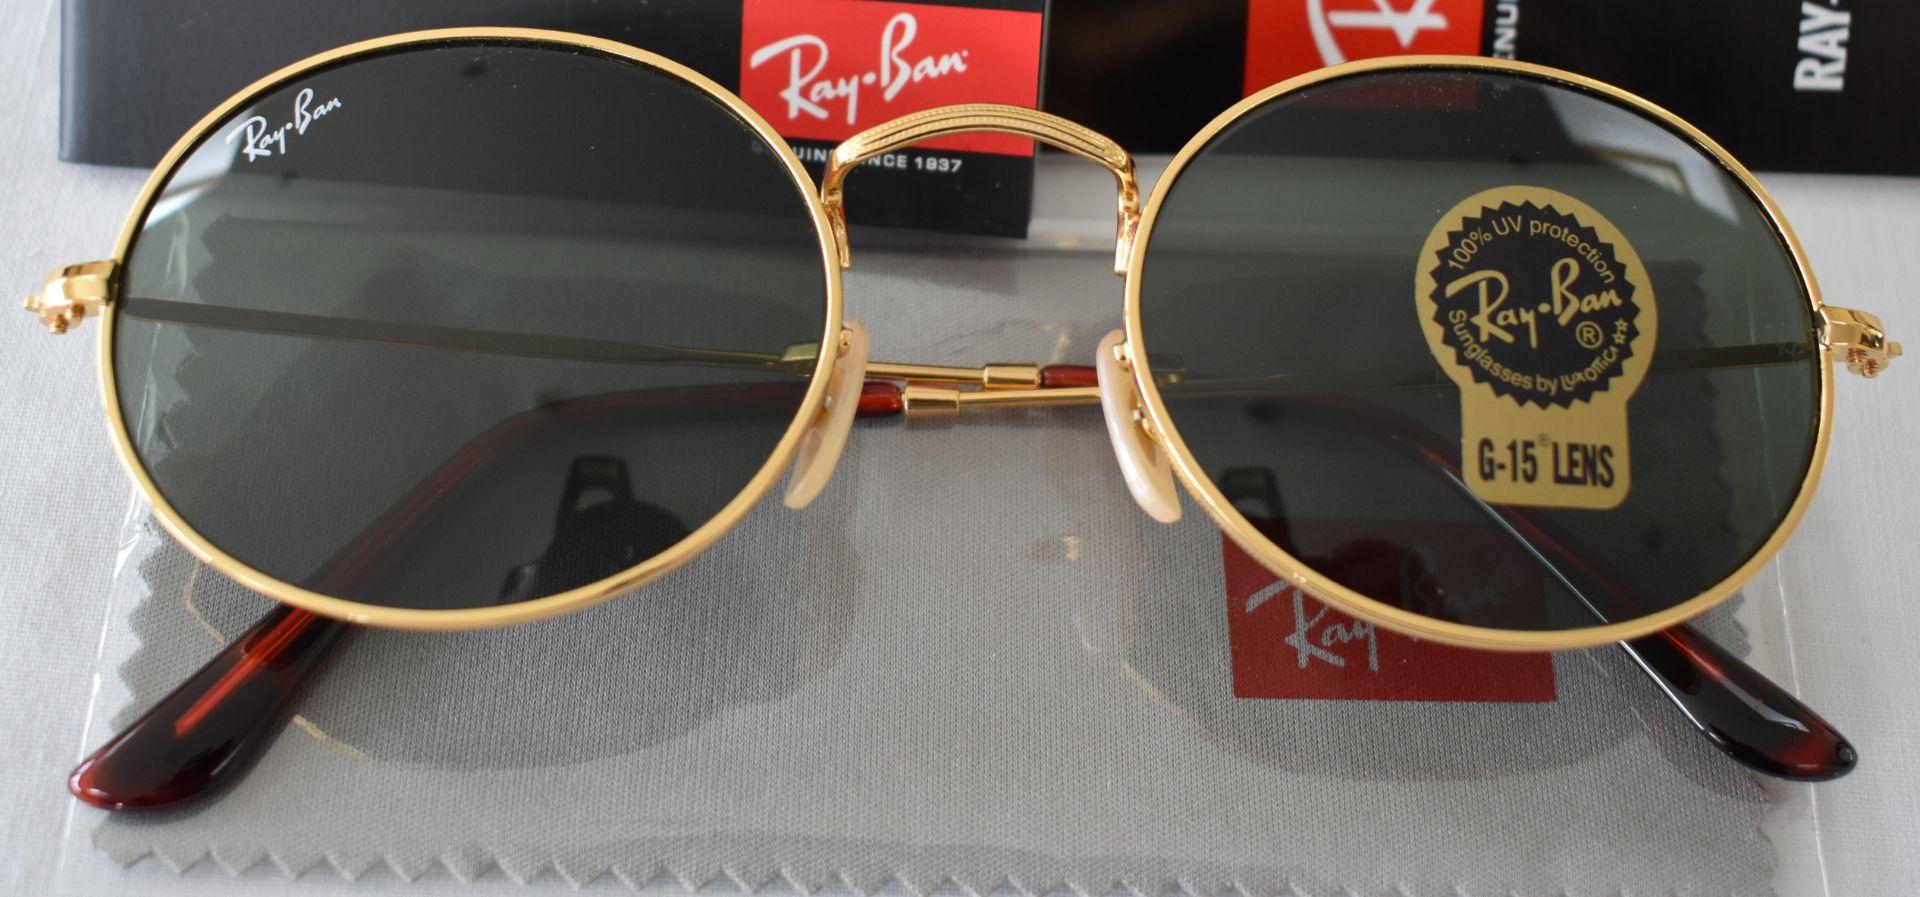 Ray Ban Sunglasses ORB3547N 001 *3N - Image 2 of 3